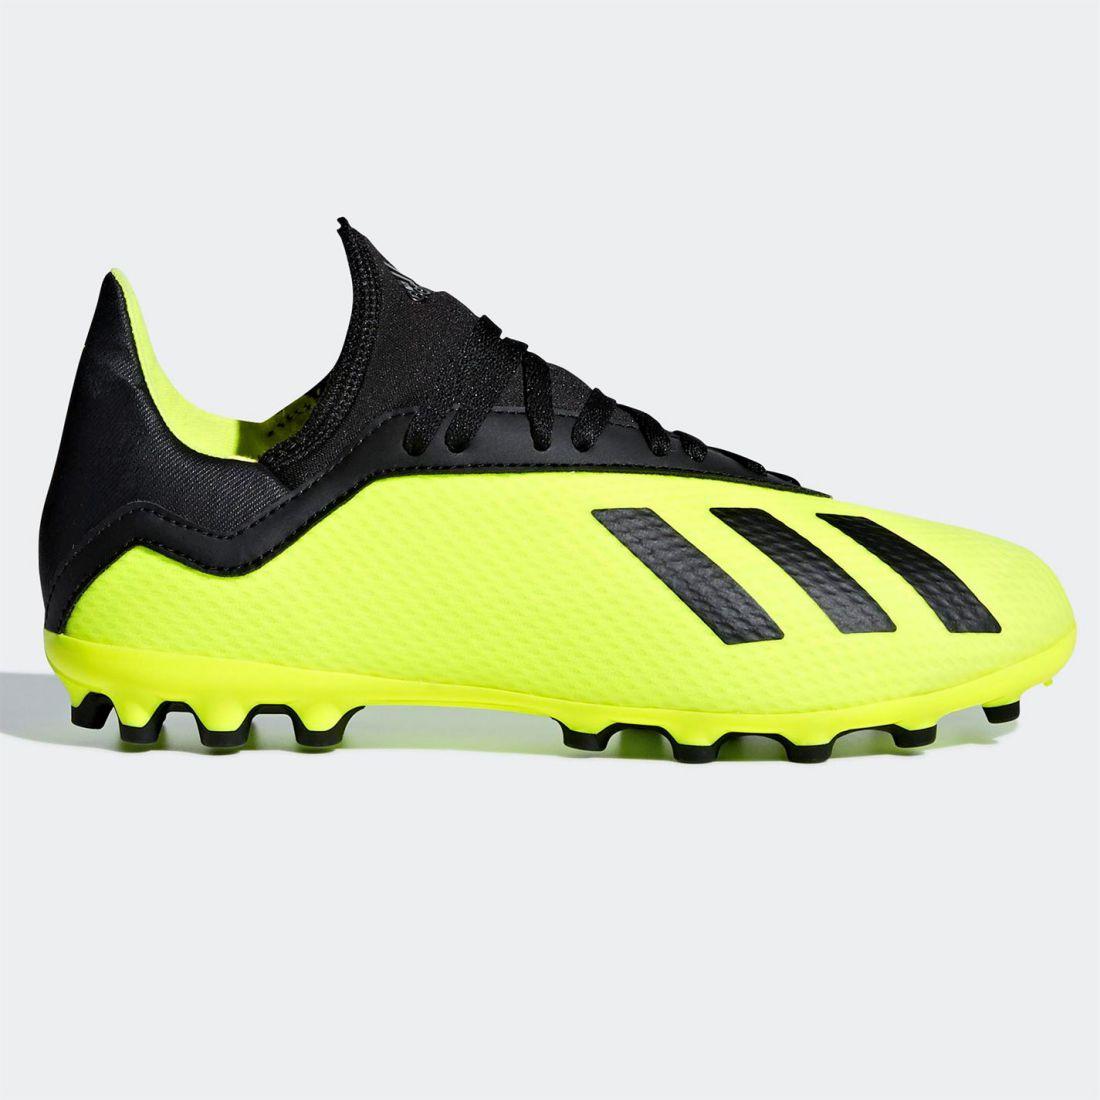 super popular 1ce9a c22e1 adidas Kids X 18.3 Childs AG Football Boots Firm Ground Lace Up Lightweight  Mesh